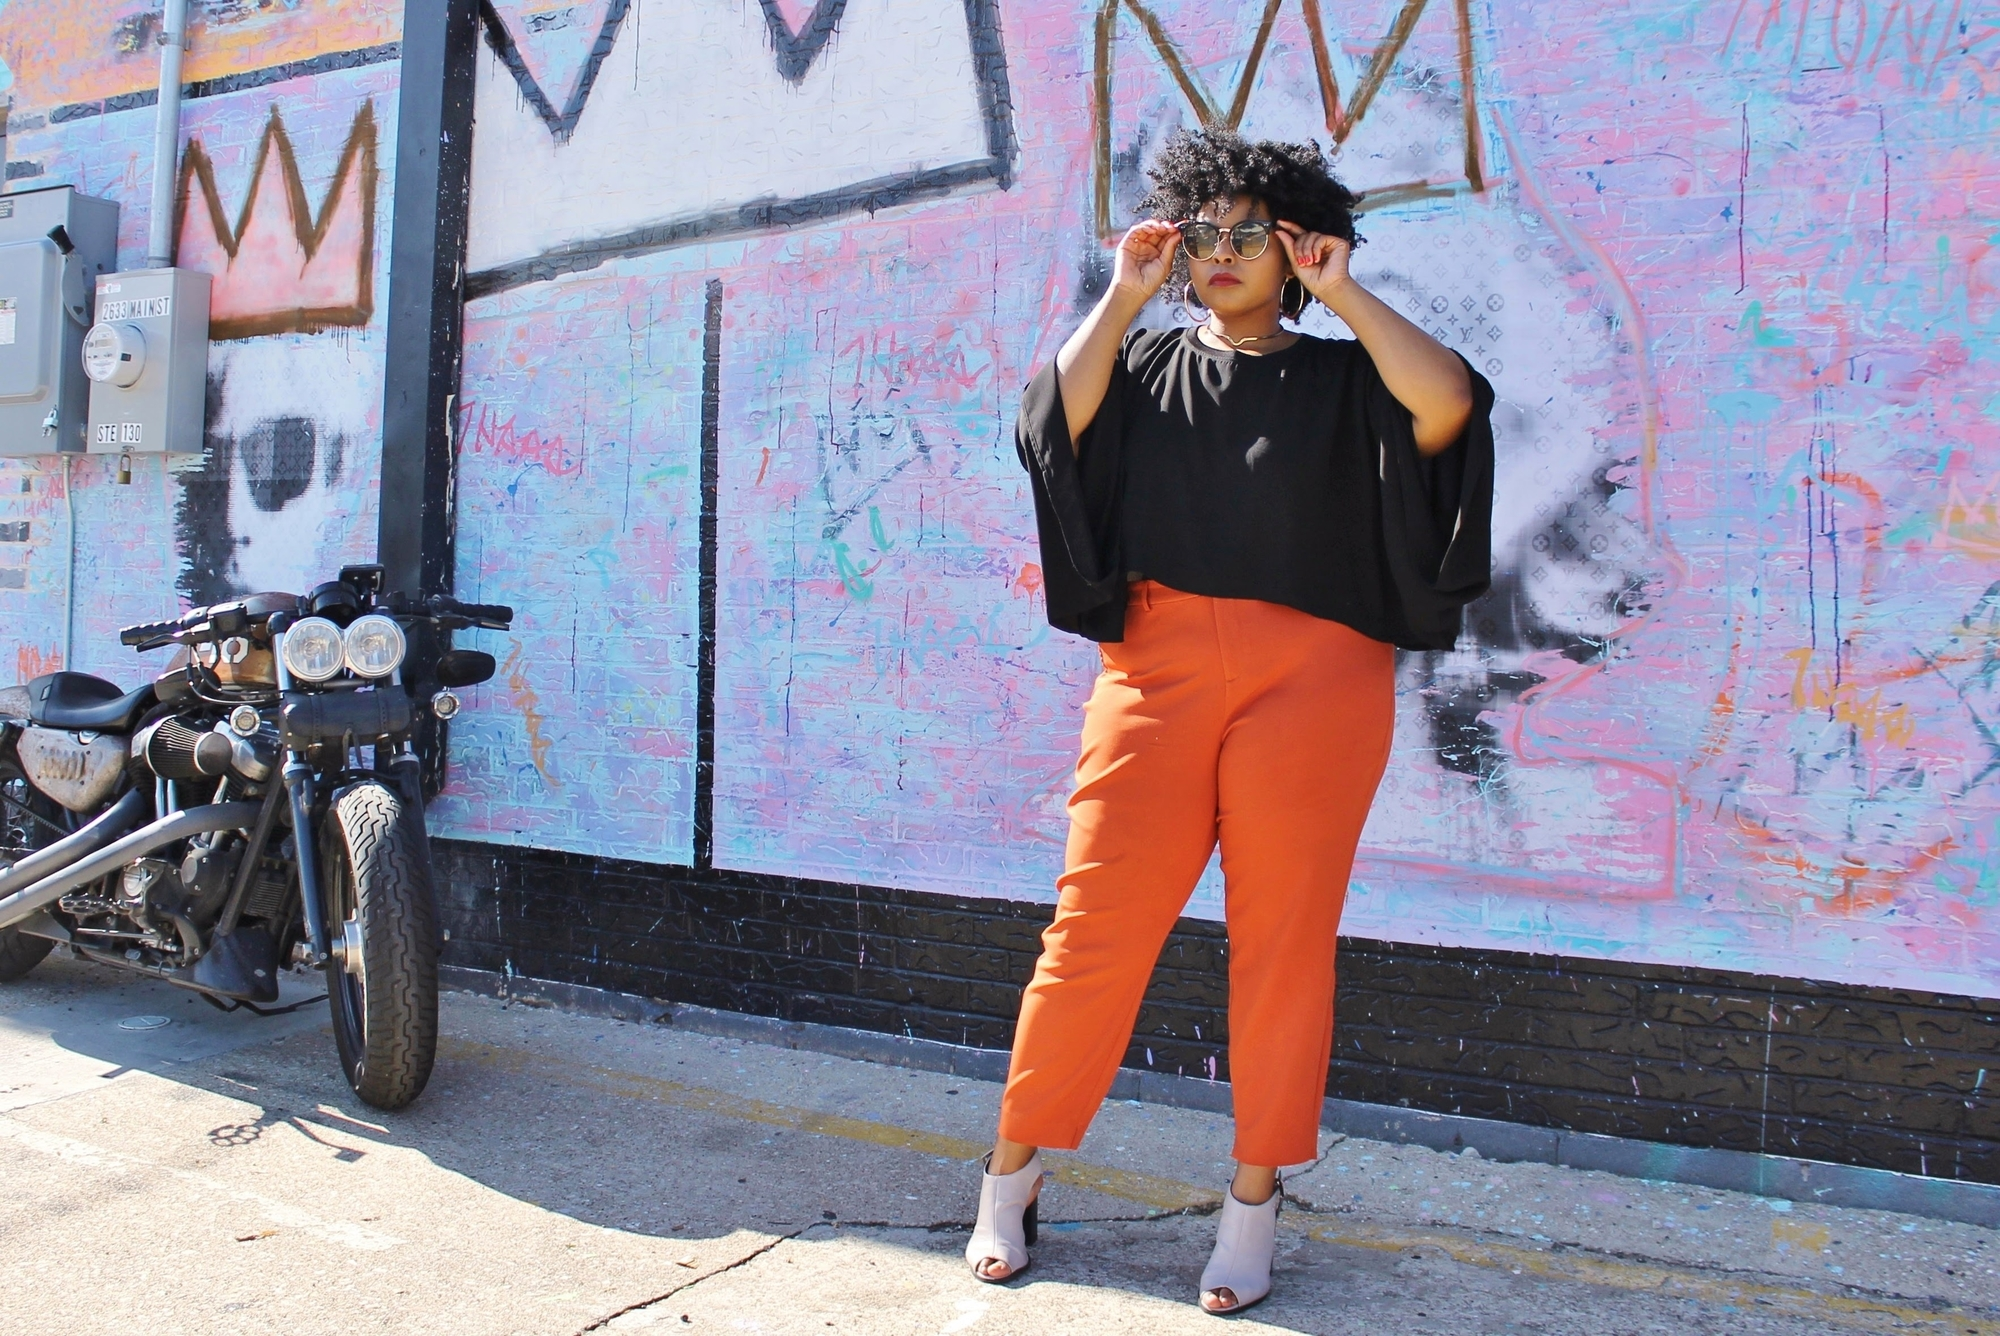 mommy blogger adjusting sunglasses